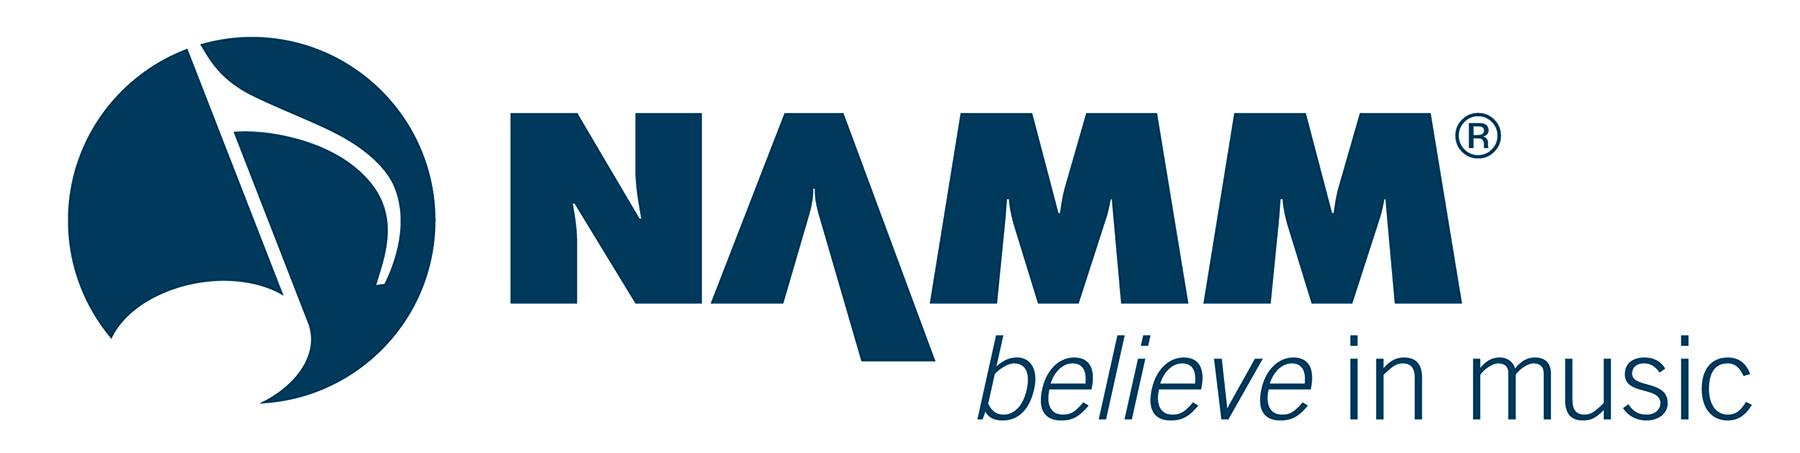 NAMM Believe blue